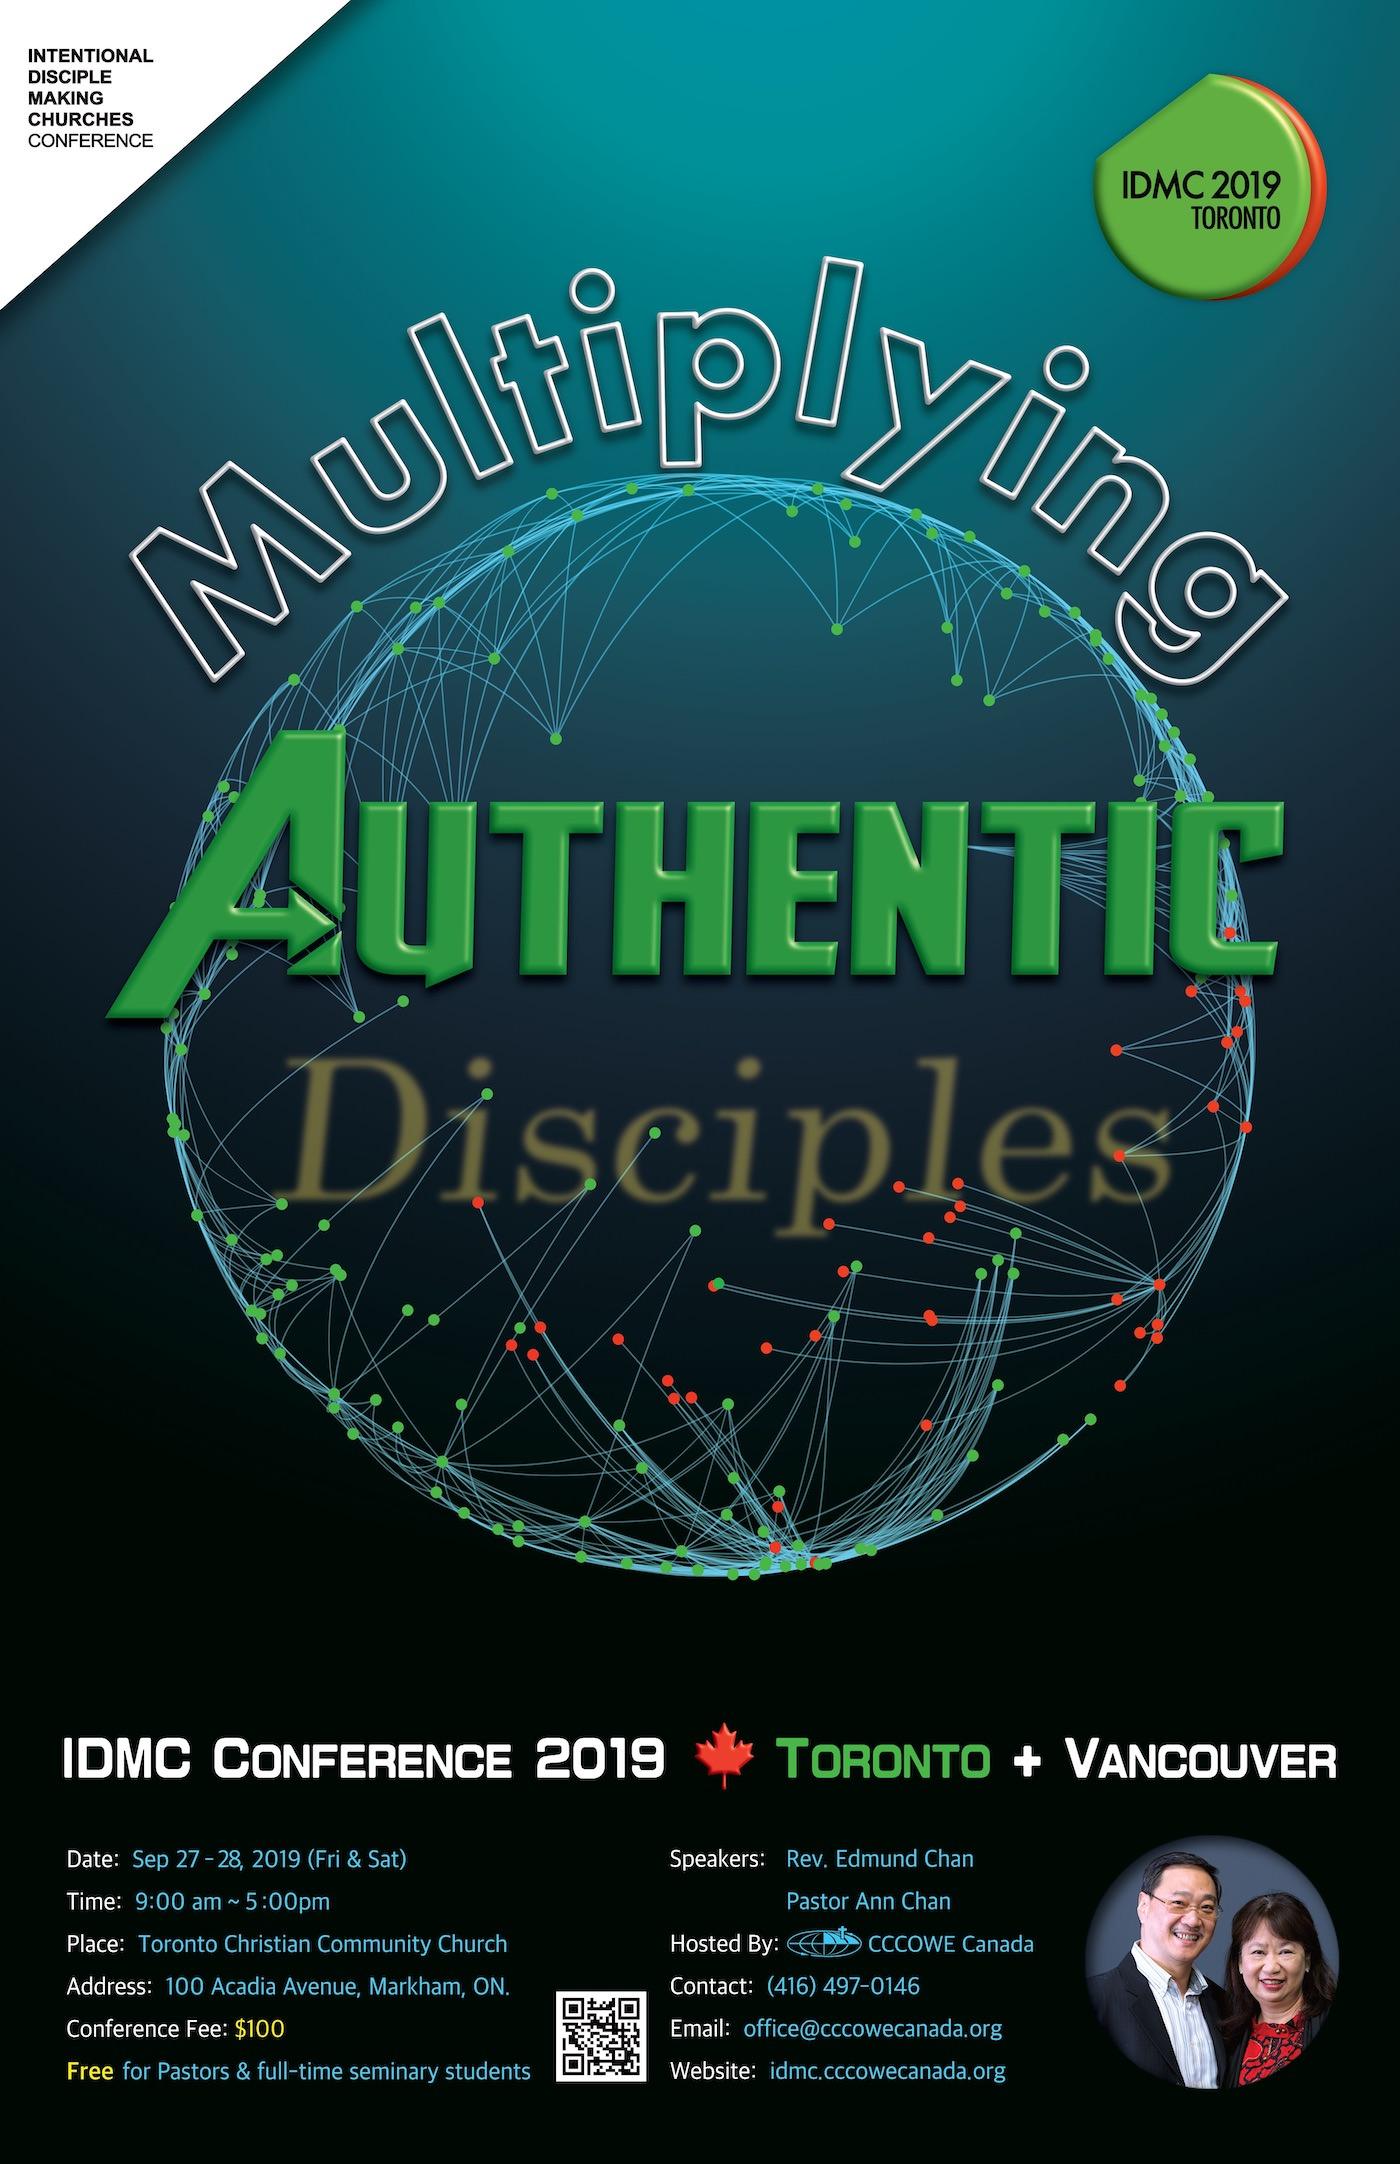 2019 IDMC Conference – CCCOWE Canada